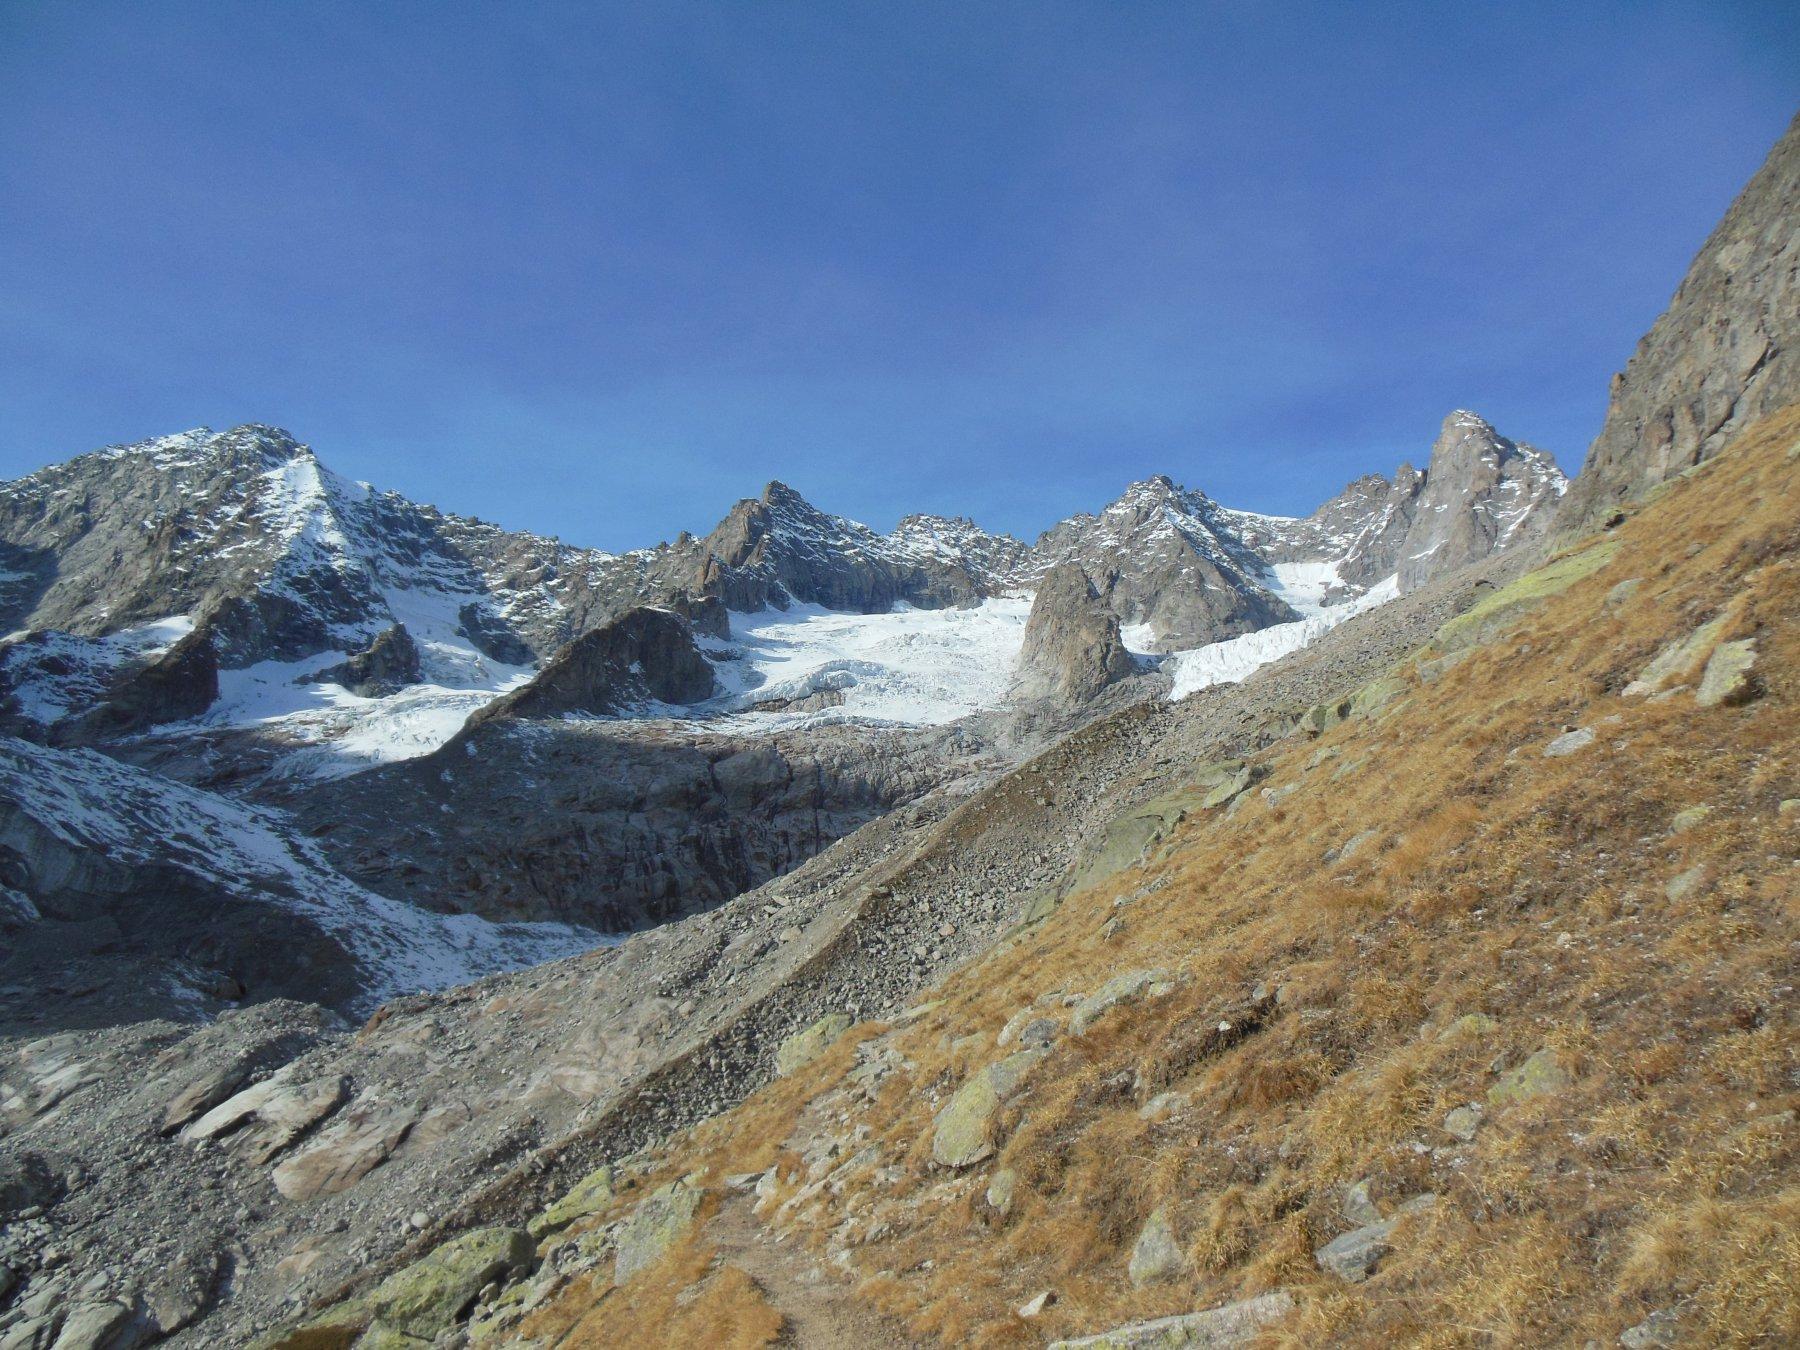 le numerose Aiguille sul ghiacciaio del Triolet